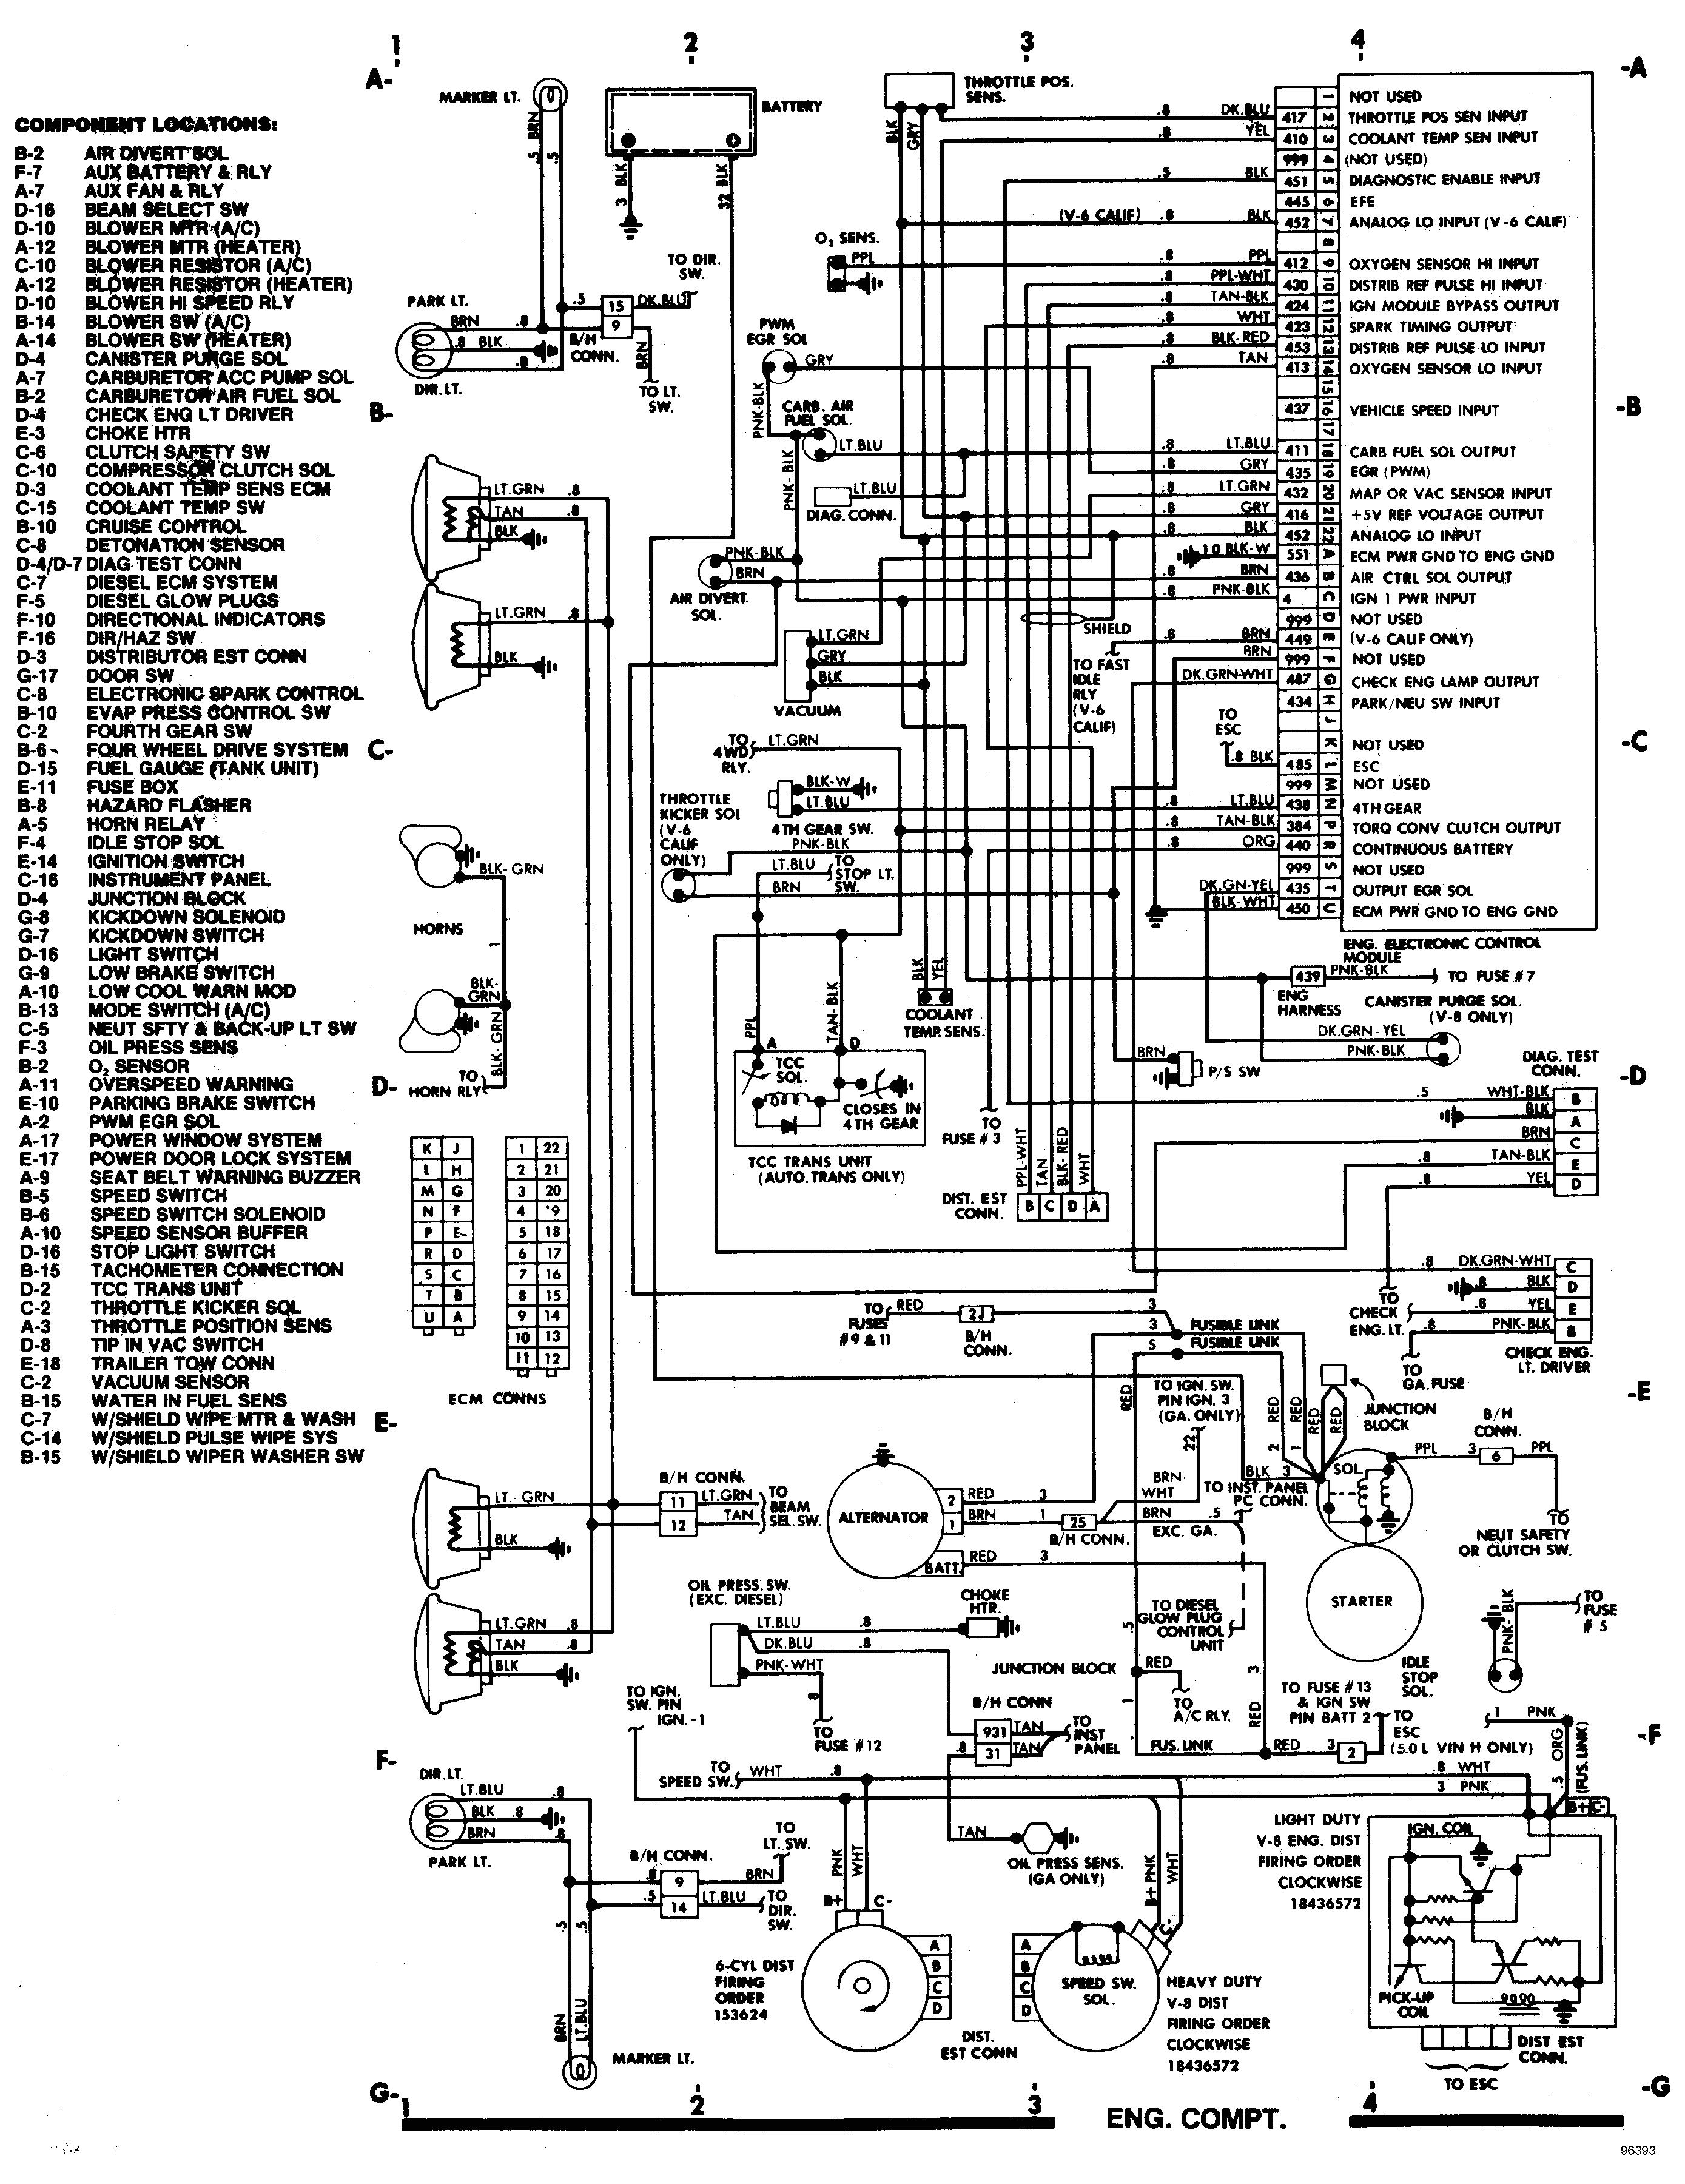 86 chevrolet pickup wiring schematics wiring diagram database chevy wiring diagrams fuel pump 86 chevy truck